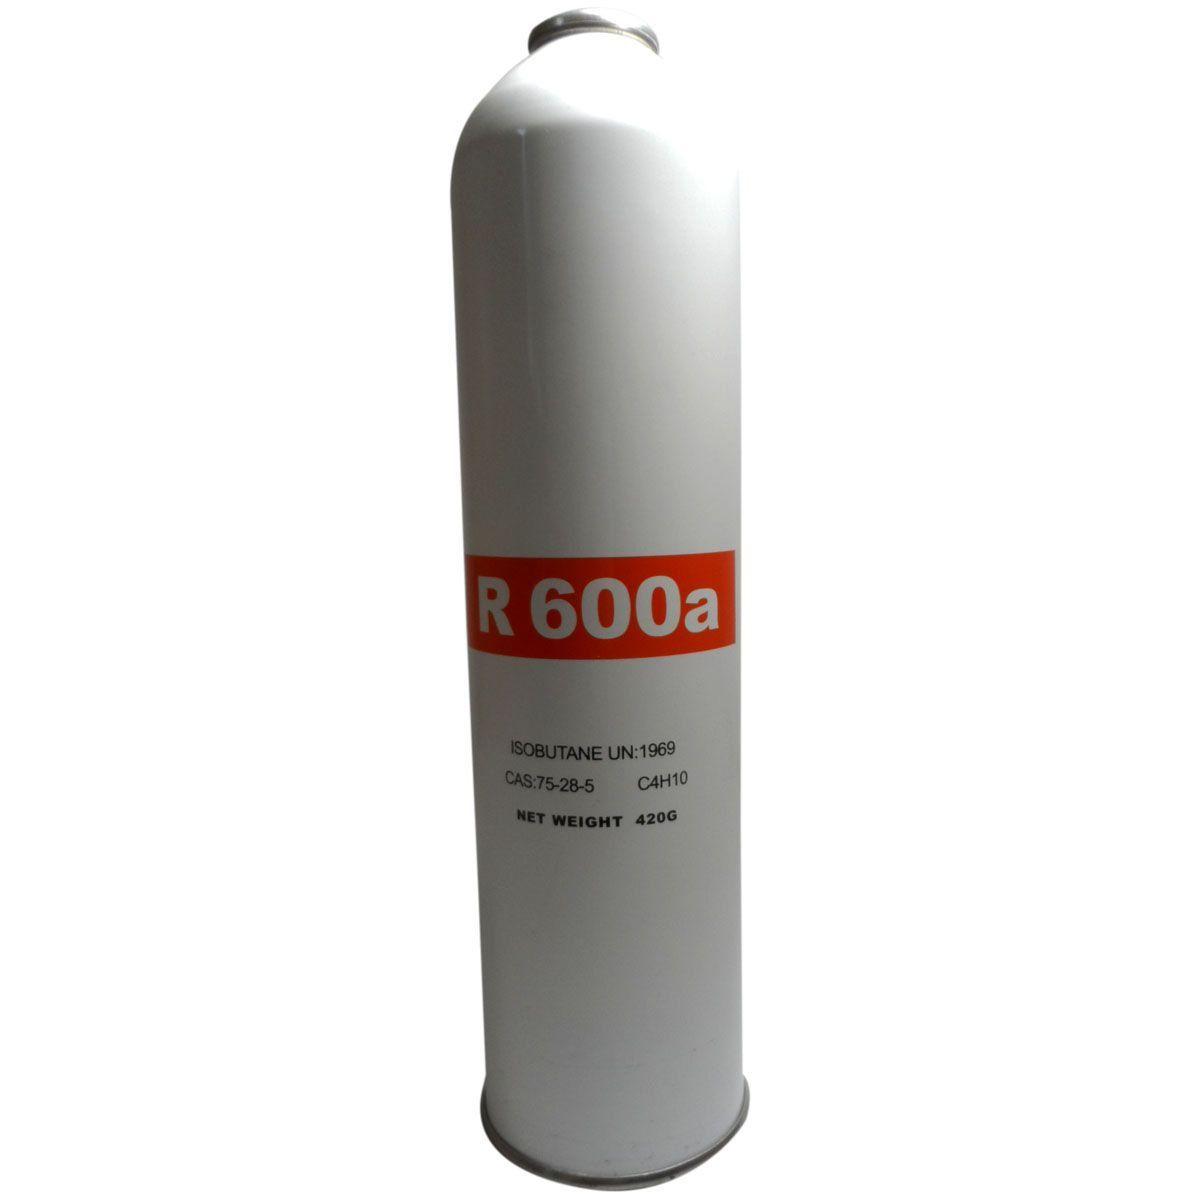 GÁS R600A LATA 420G INFLAMAVEL